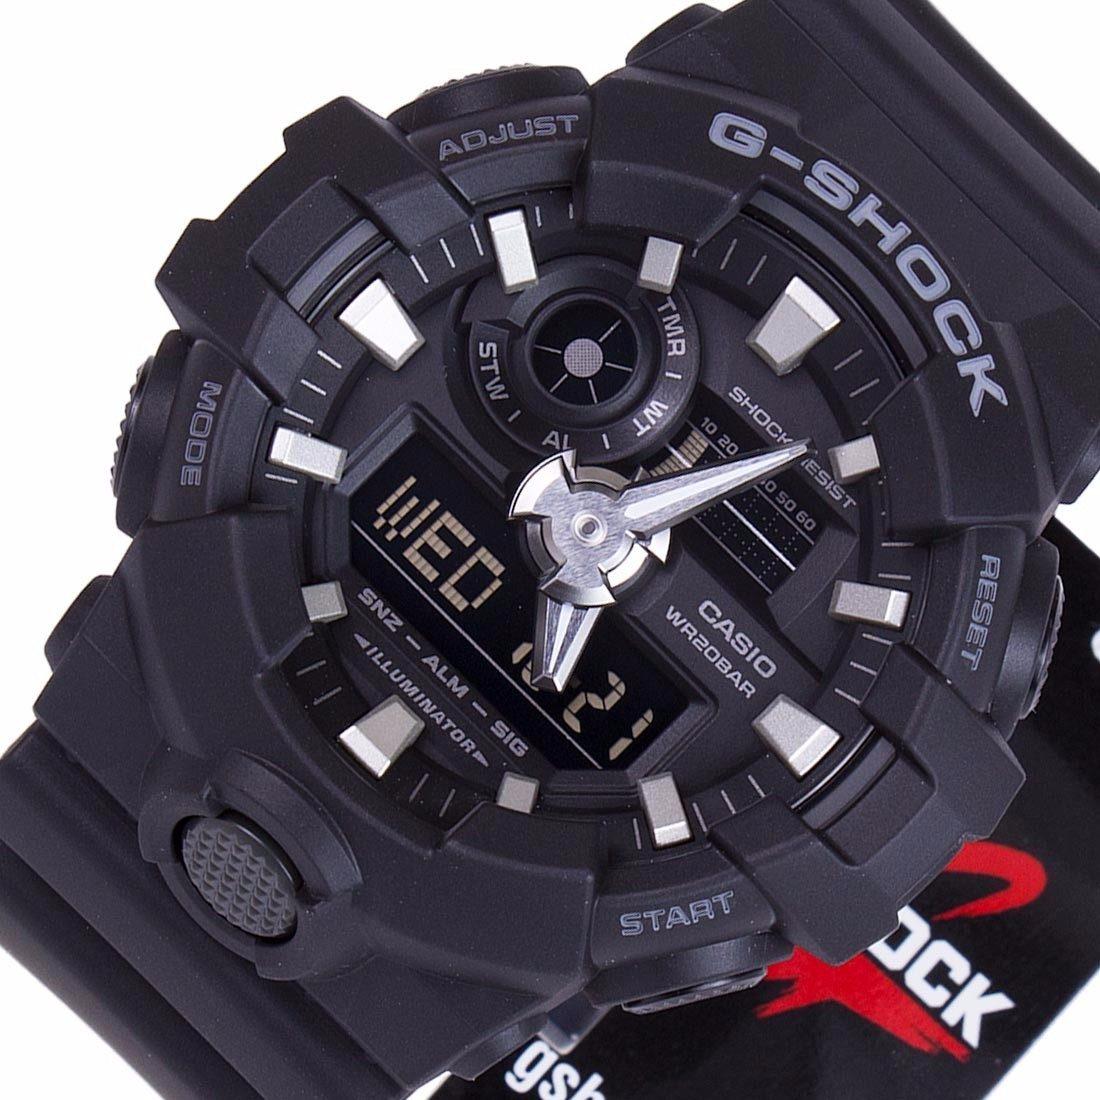 4003382dede Relogio Casio G-shock Pretodetalhes Cinza Ga-700-1bdr - R  649